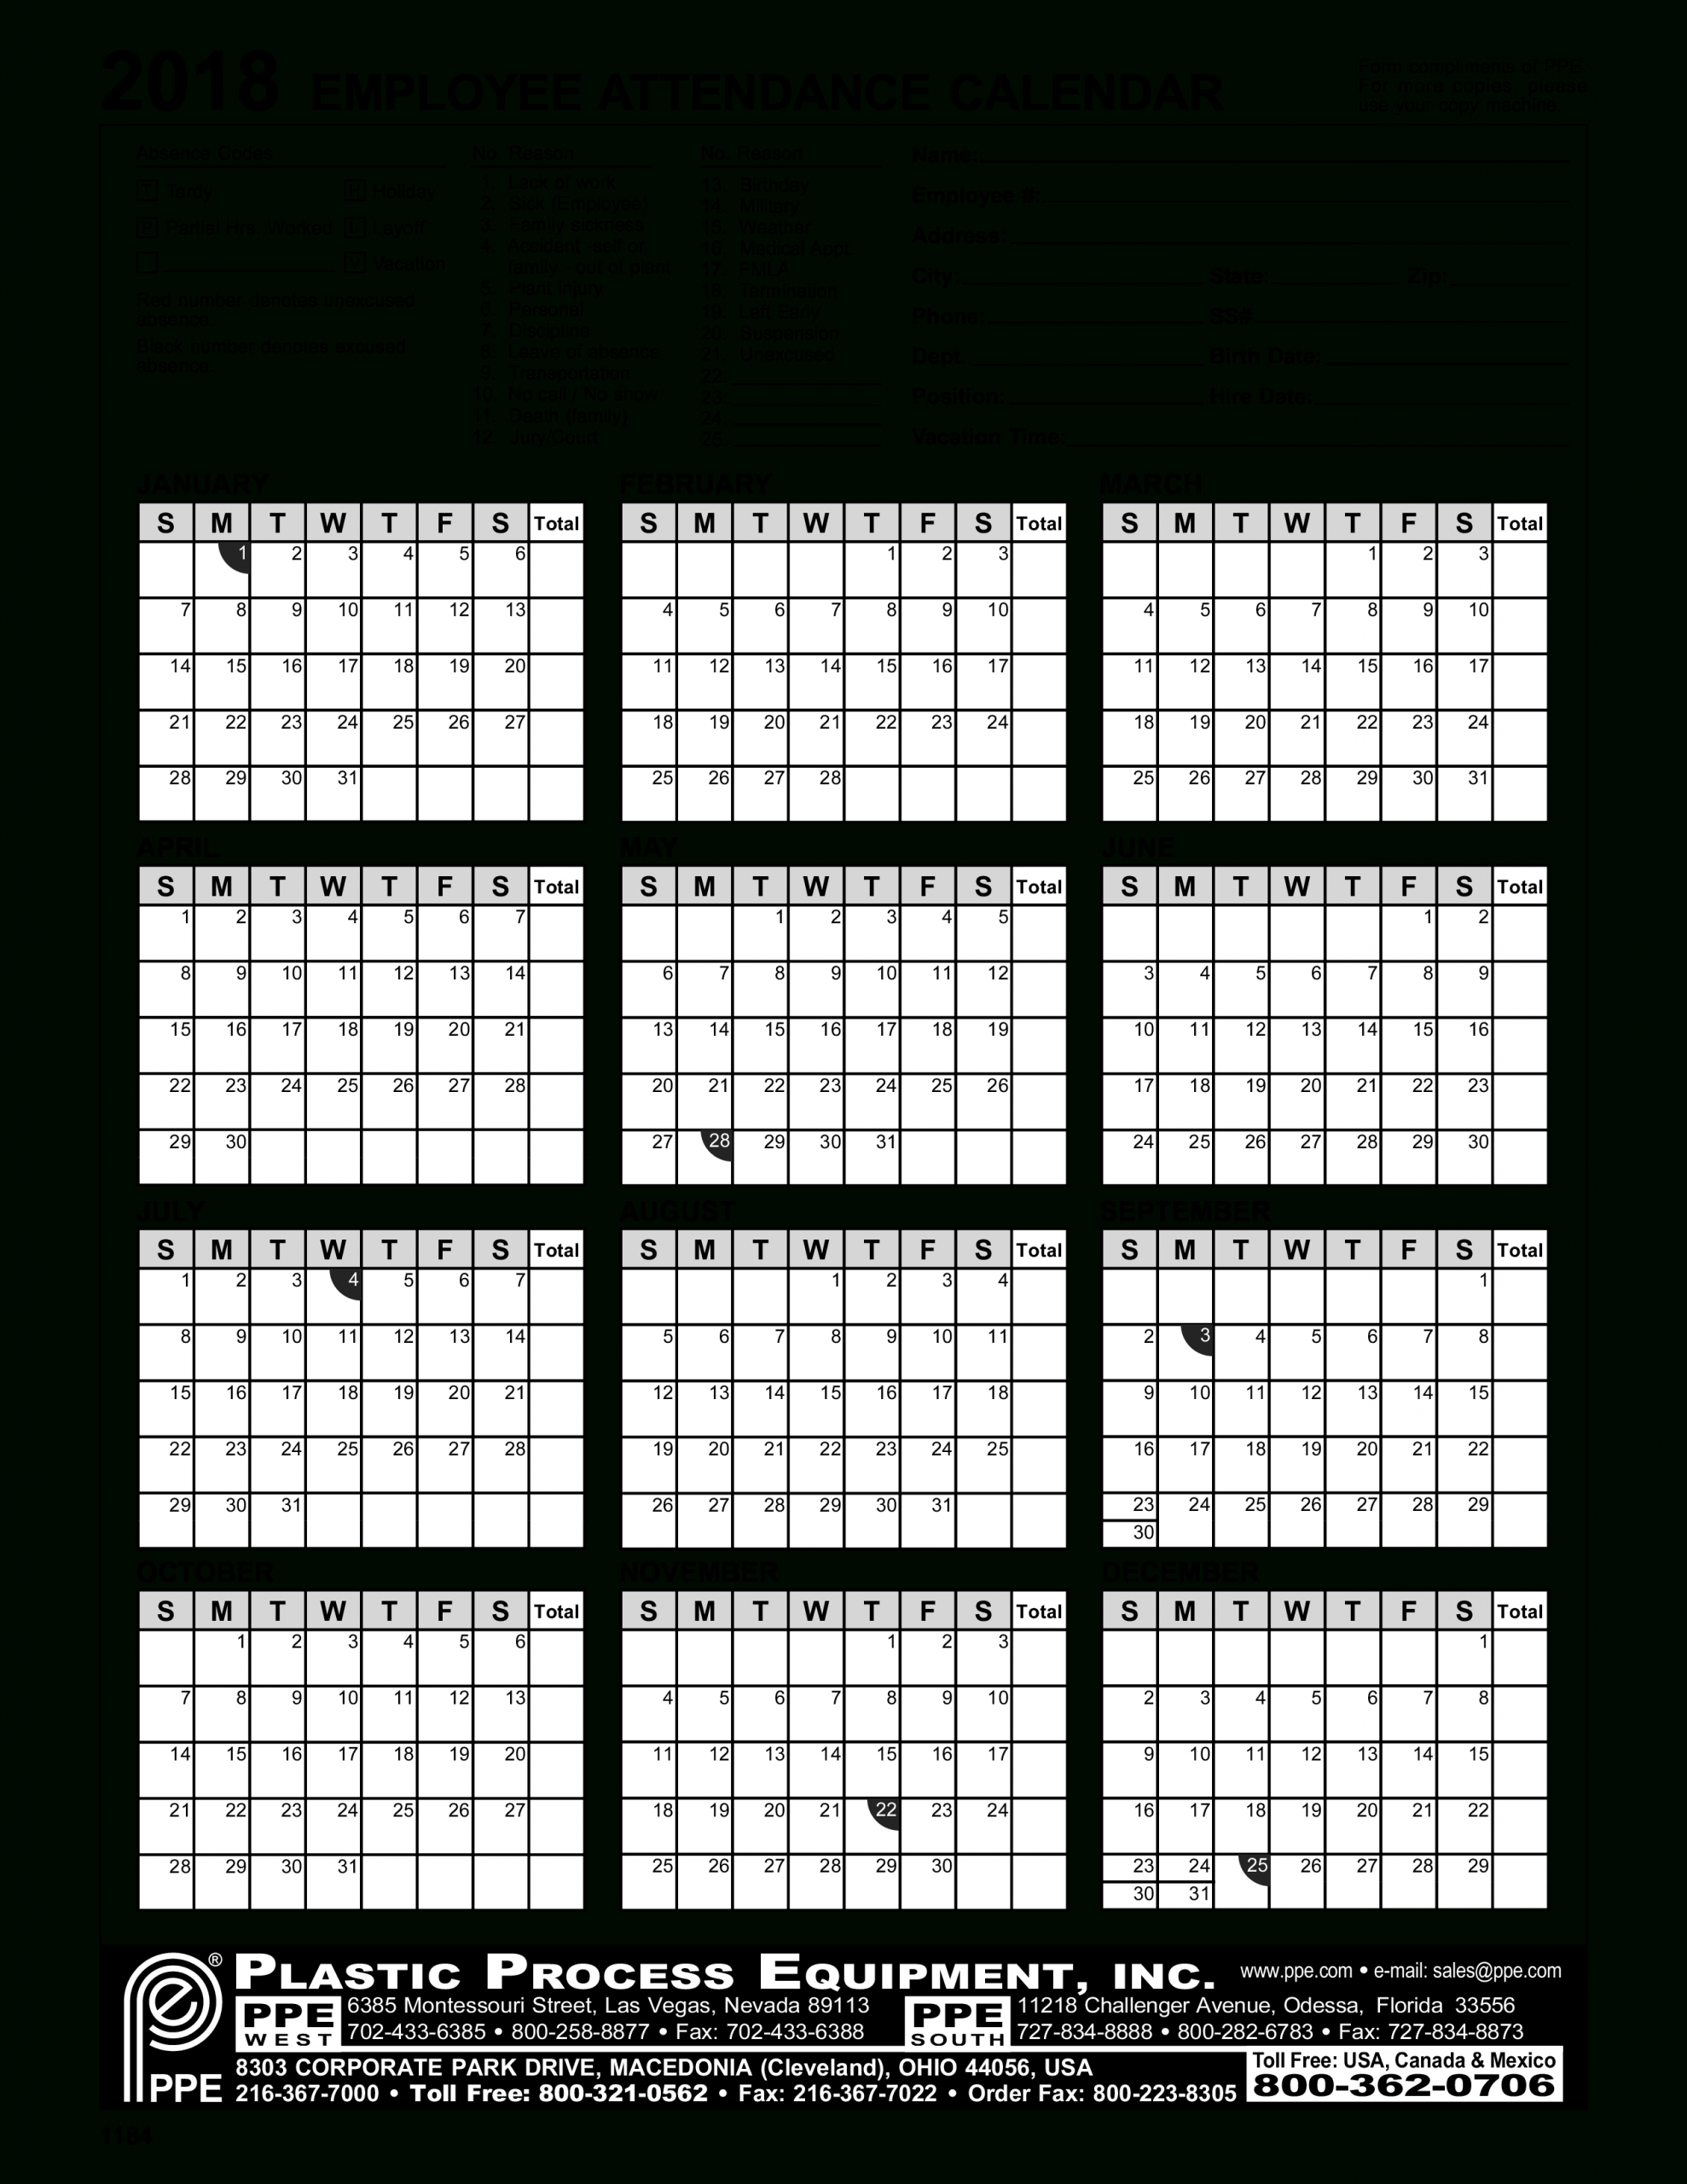 Schedule Clipart Daily Attendance, Schedule Daily Attendance